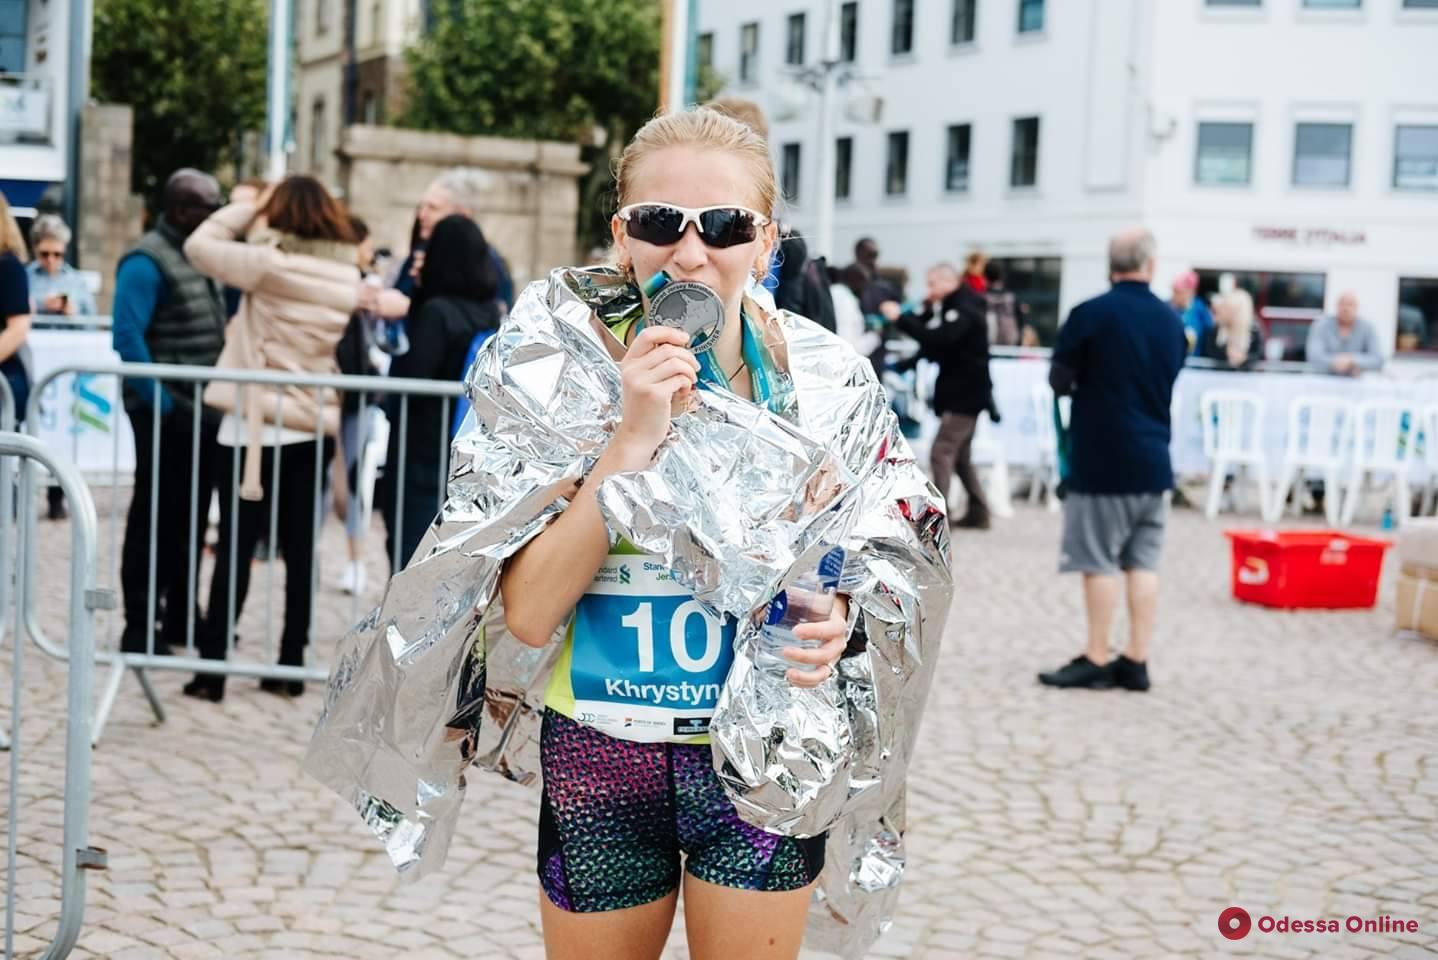 Одесситка заняла второе место в марафоне на острове Джерси